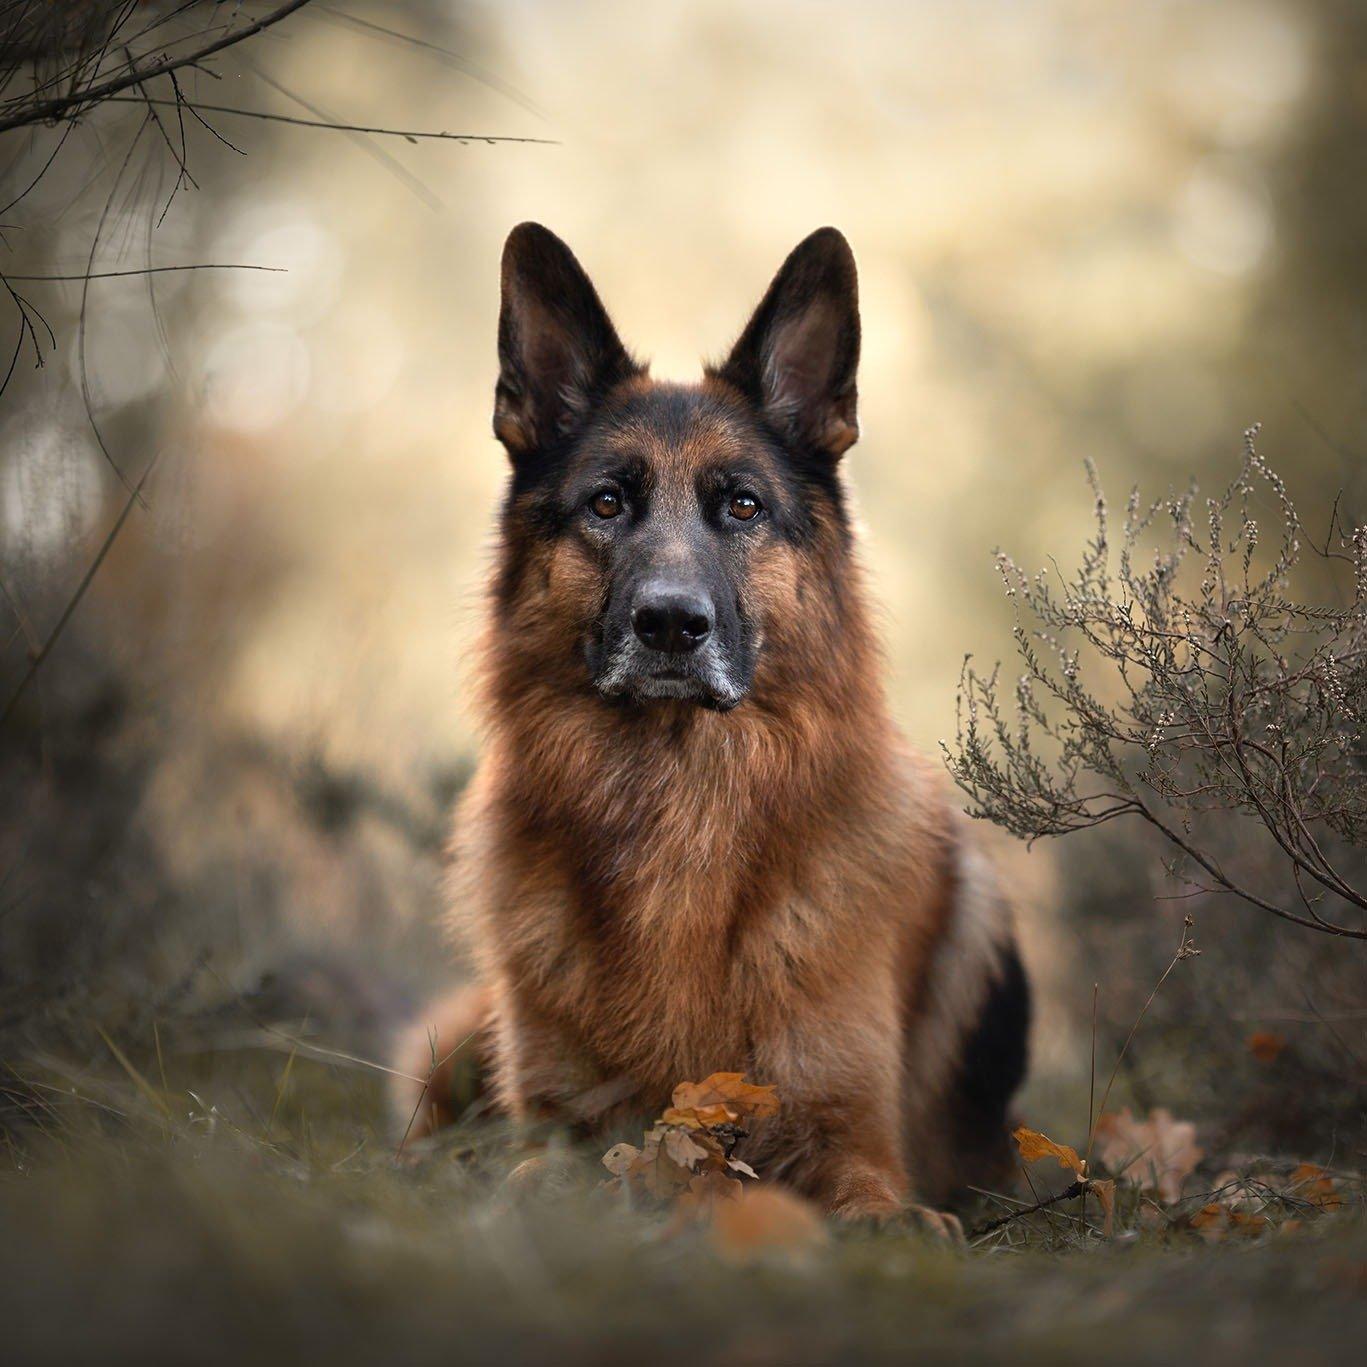 Duitse Herder (German Shepherd Dog)